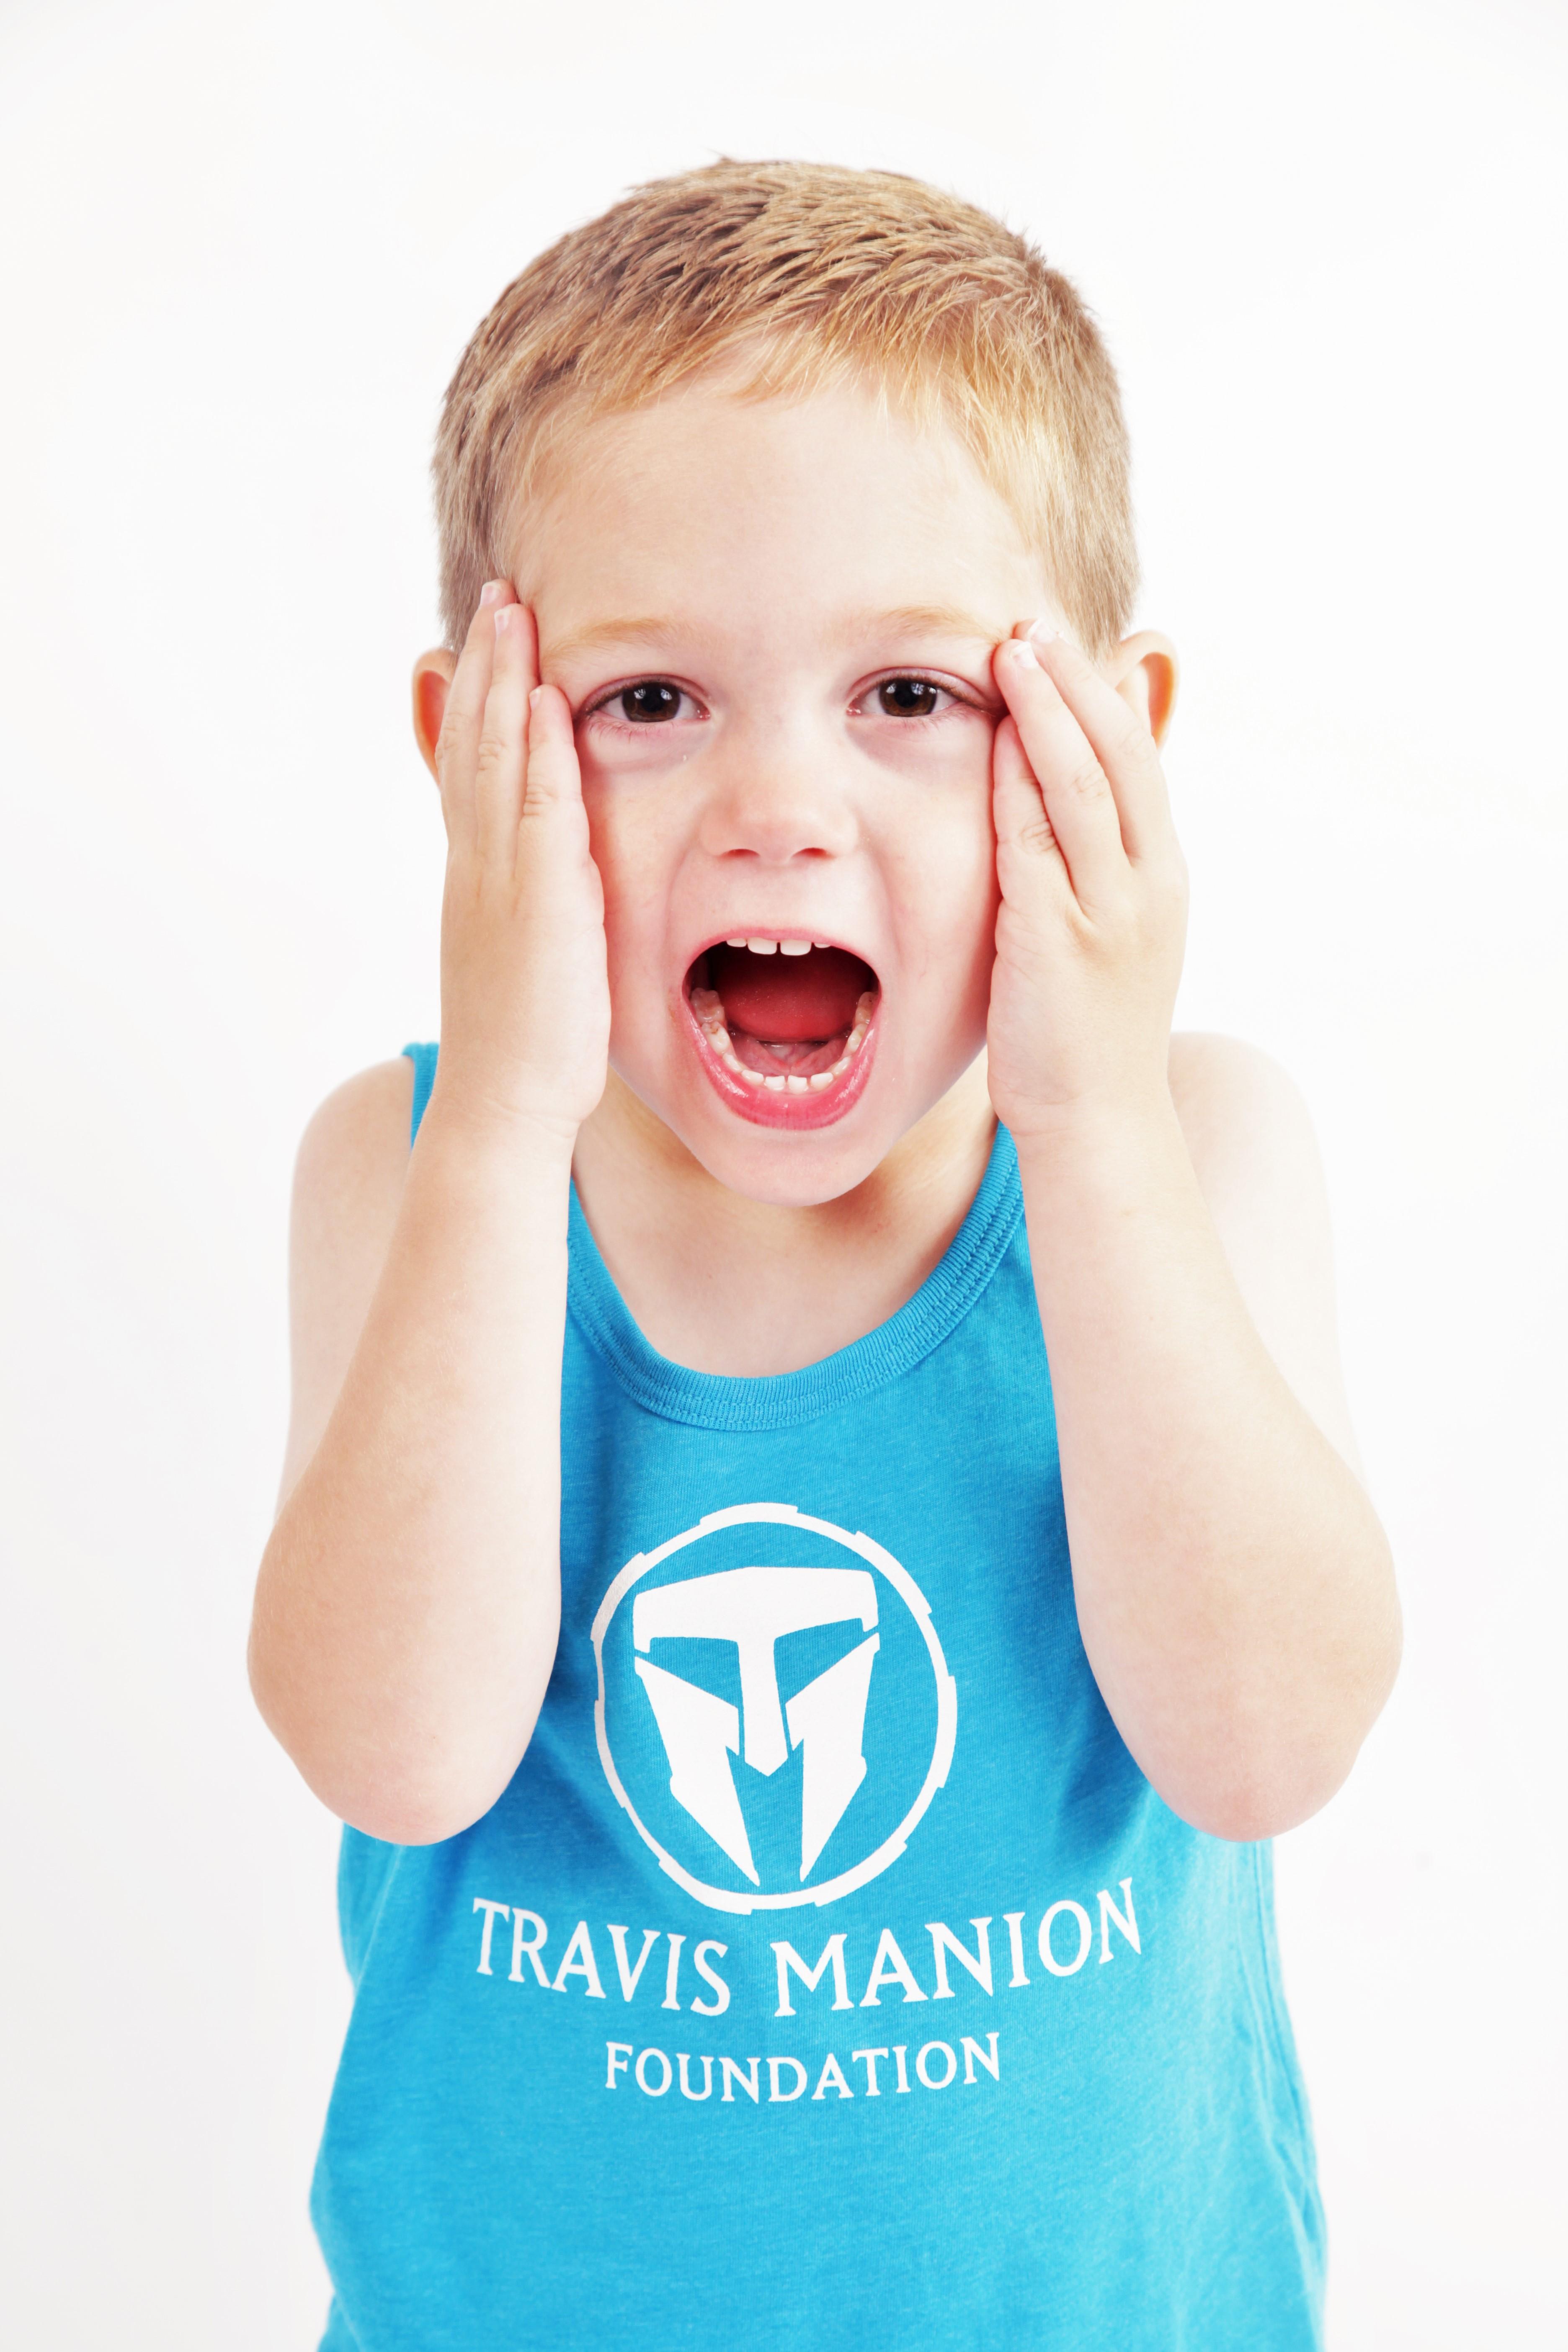 Travis Manion Foundation Neon Kids Tank